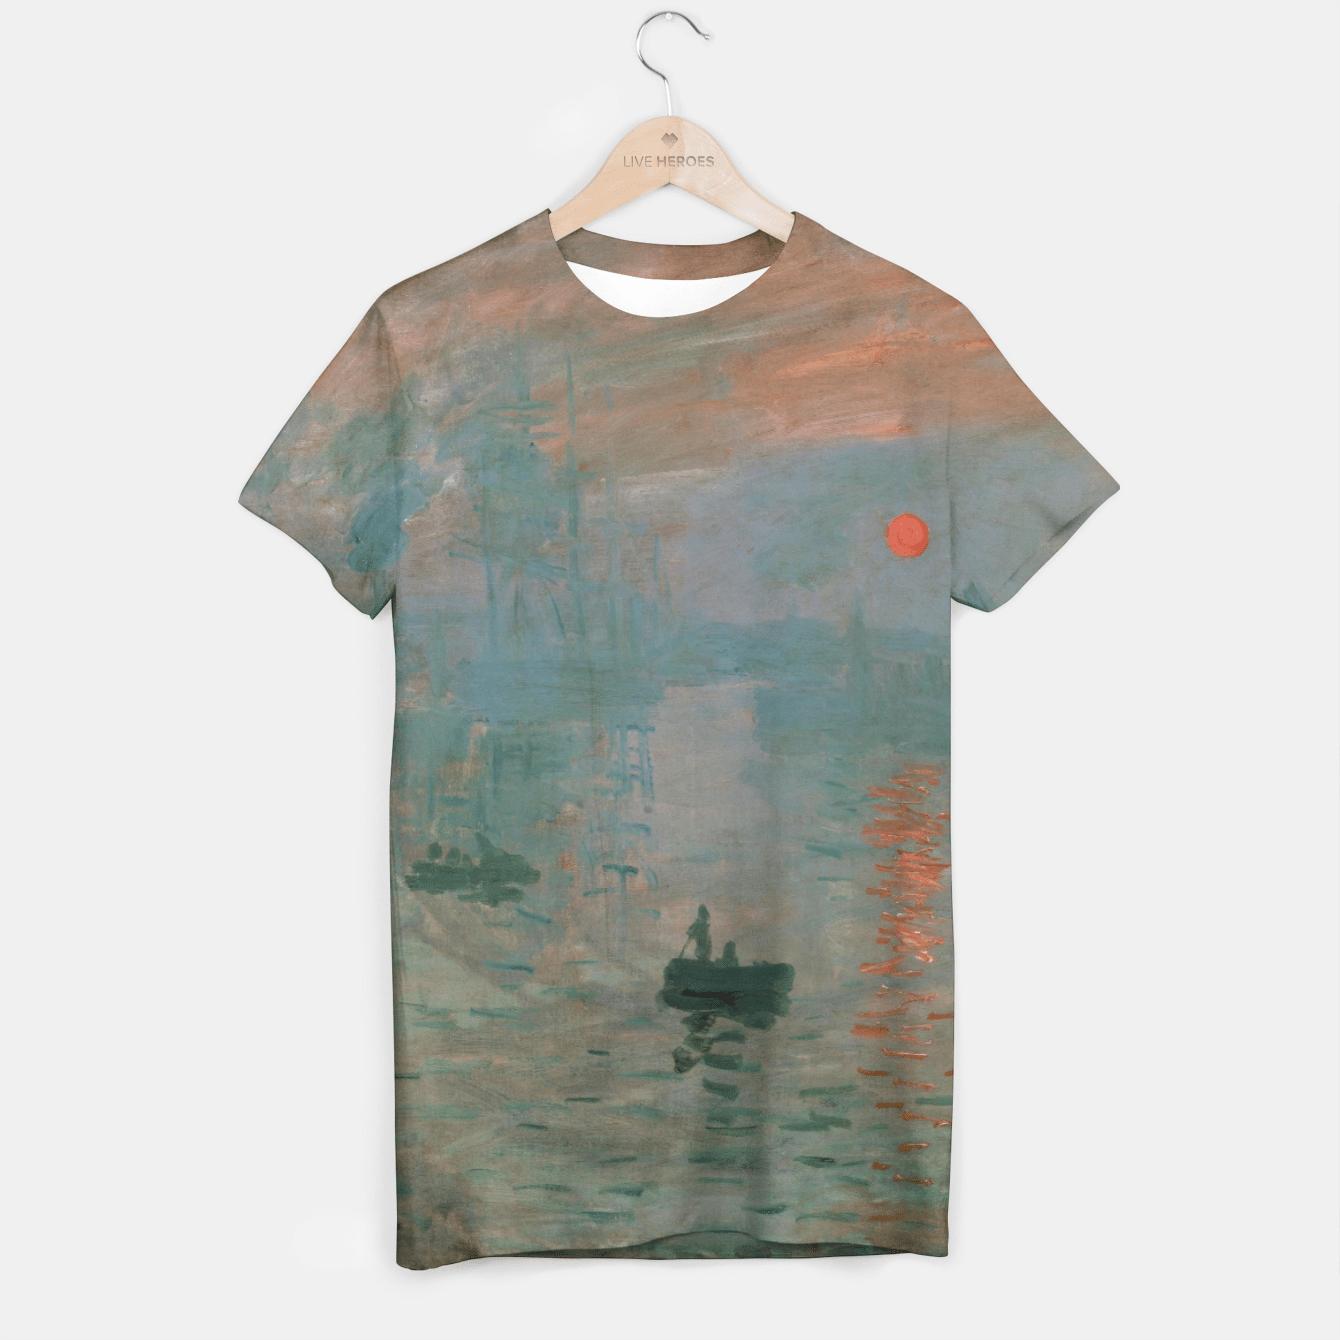 iMPRESSiON, SUNRiSE BY CLAUDE MONET T-shirt, Live Heroes